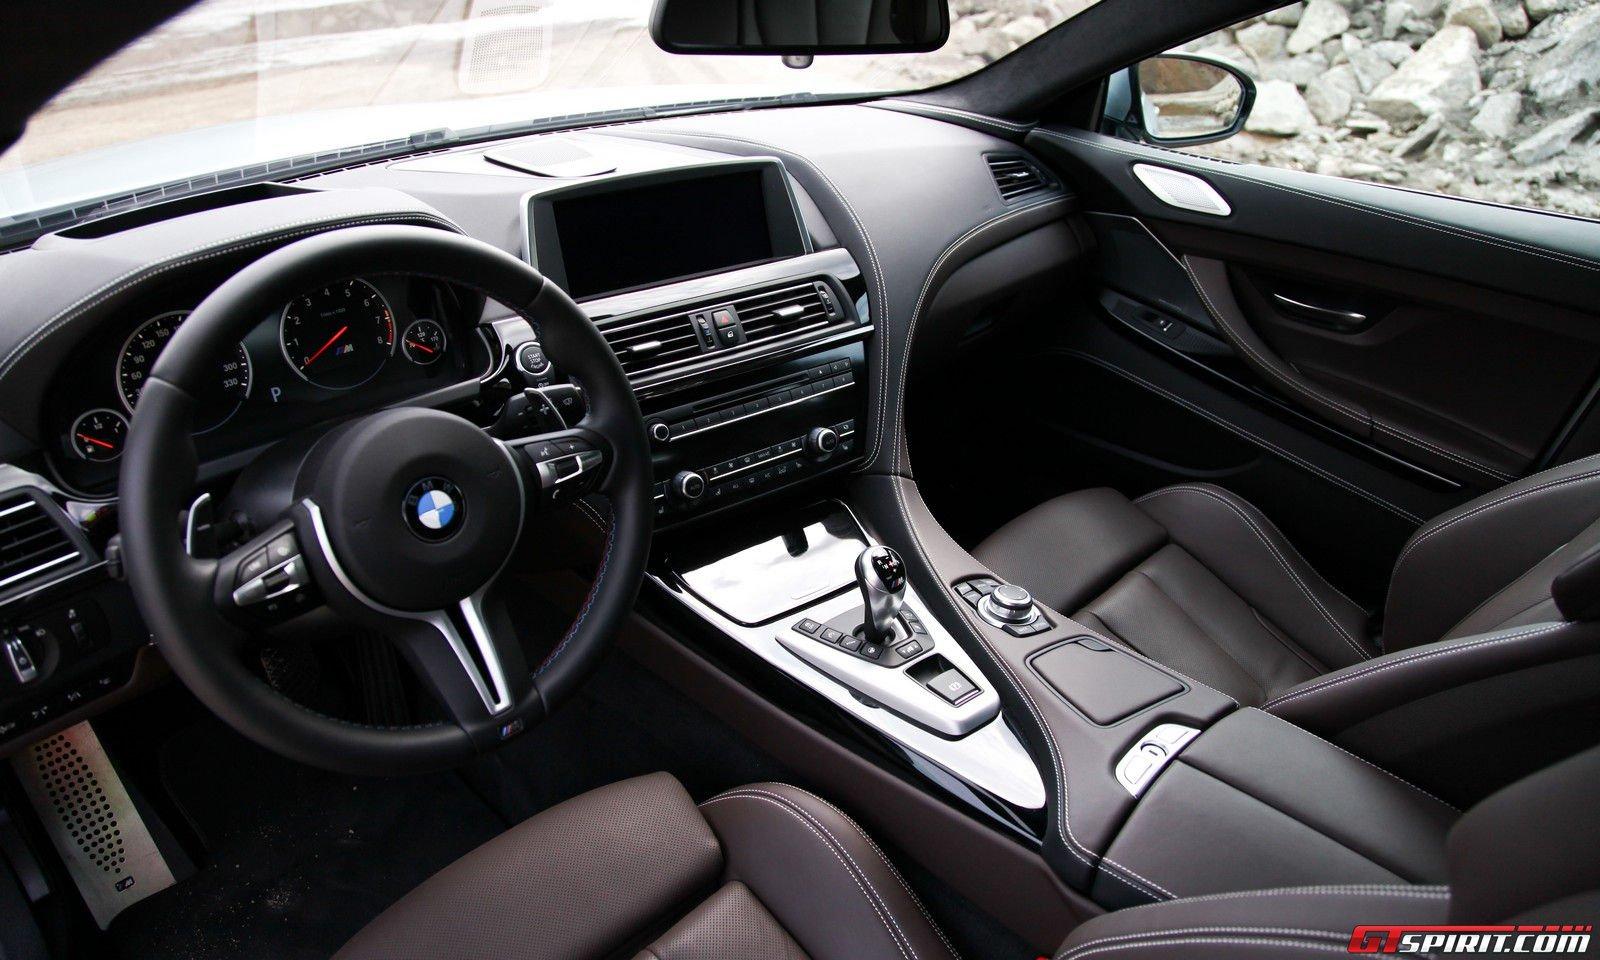 2018 Bmw M6 Gran Coupe Interior 2018 Cars Models